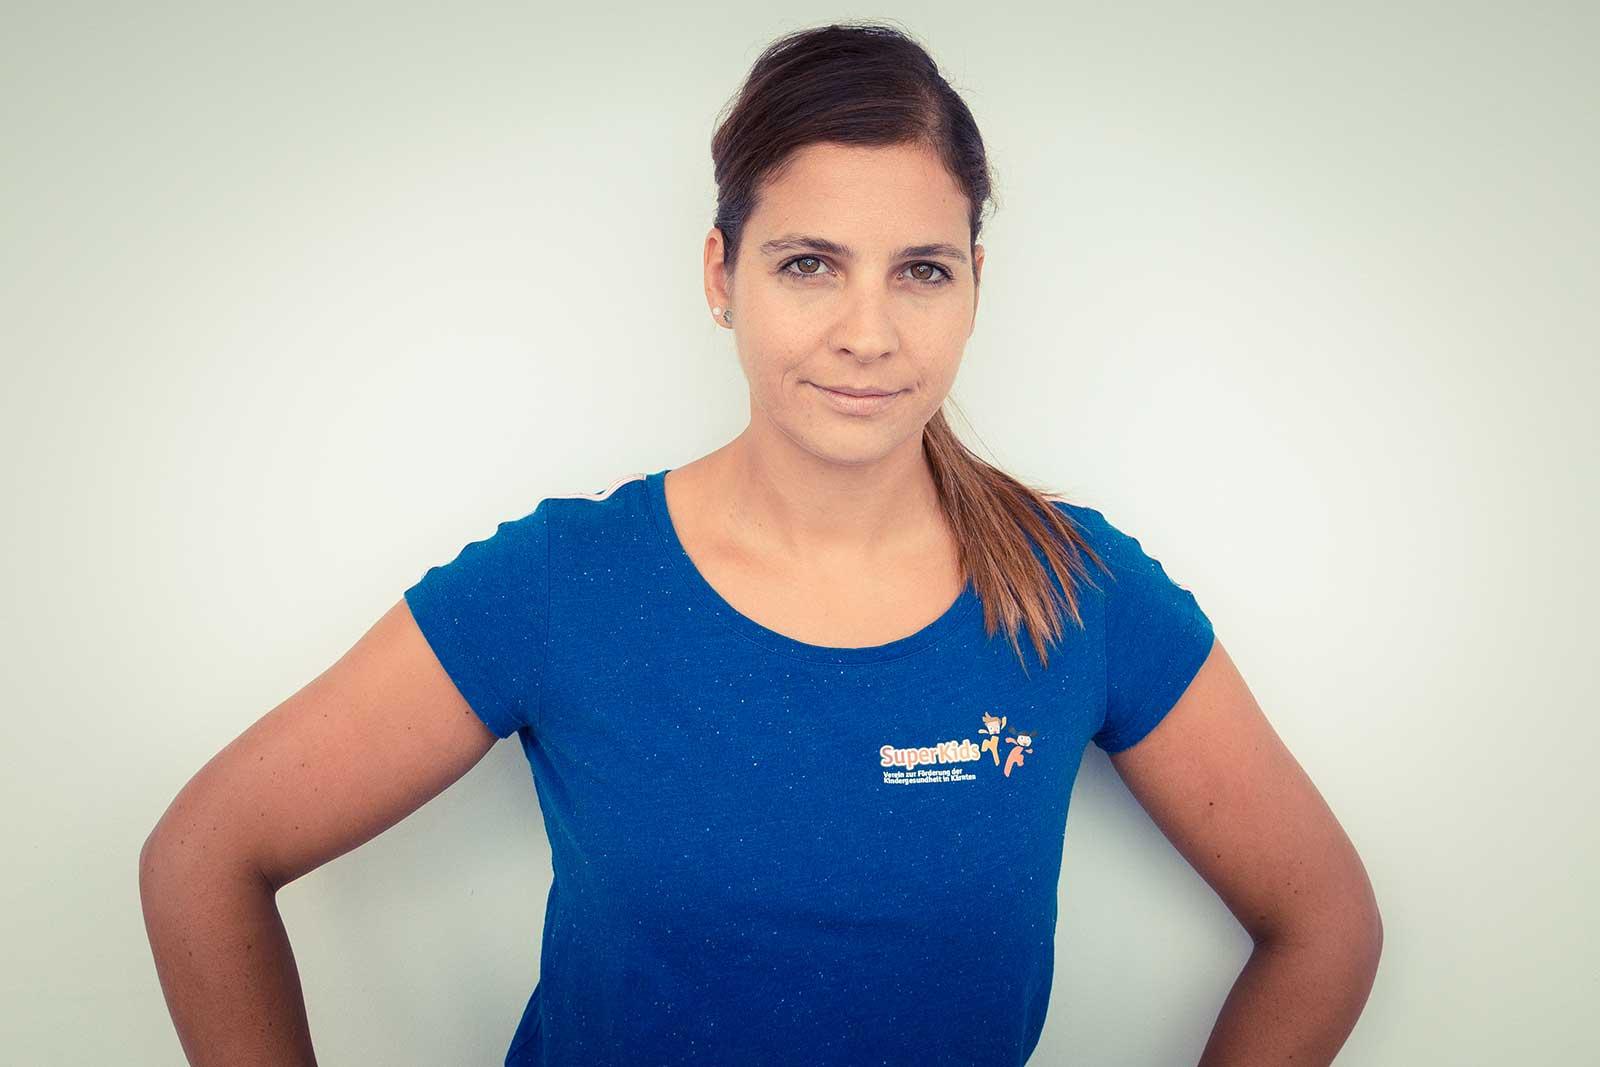 Trainerin Tanja Hasitzka